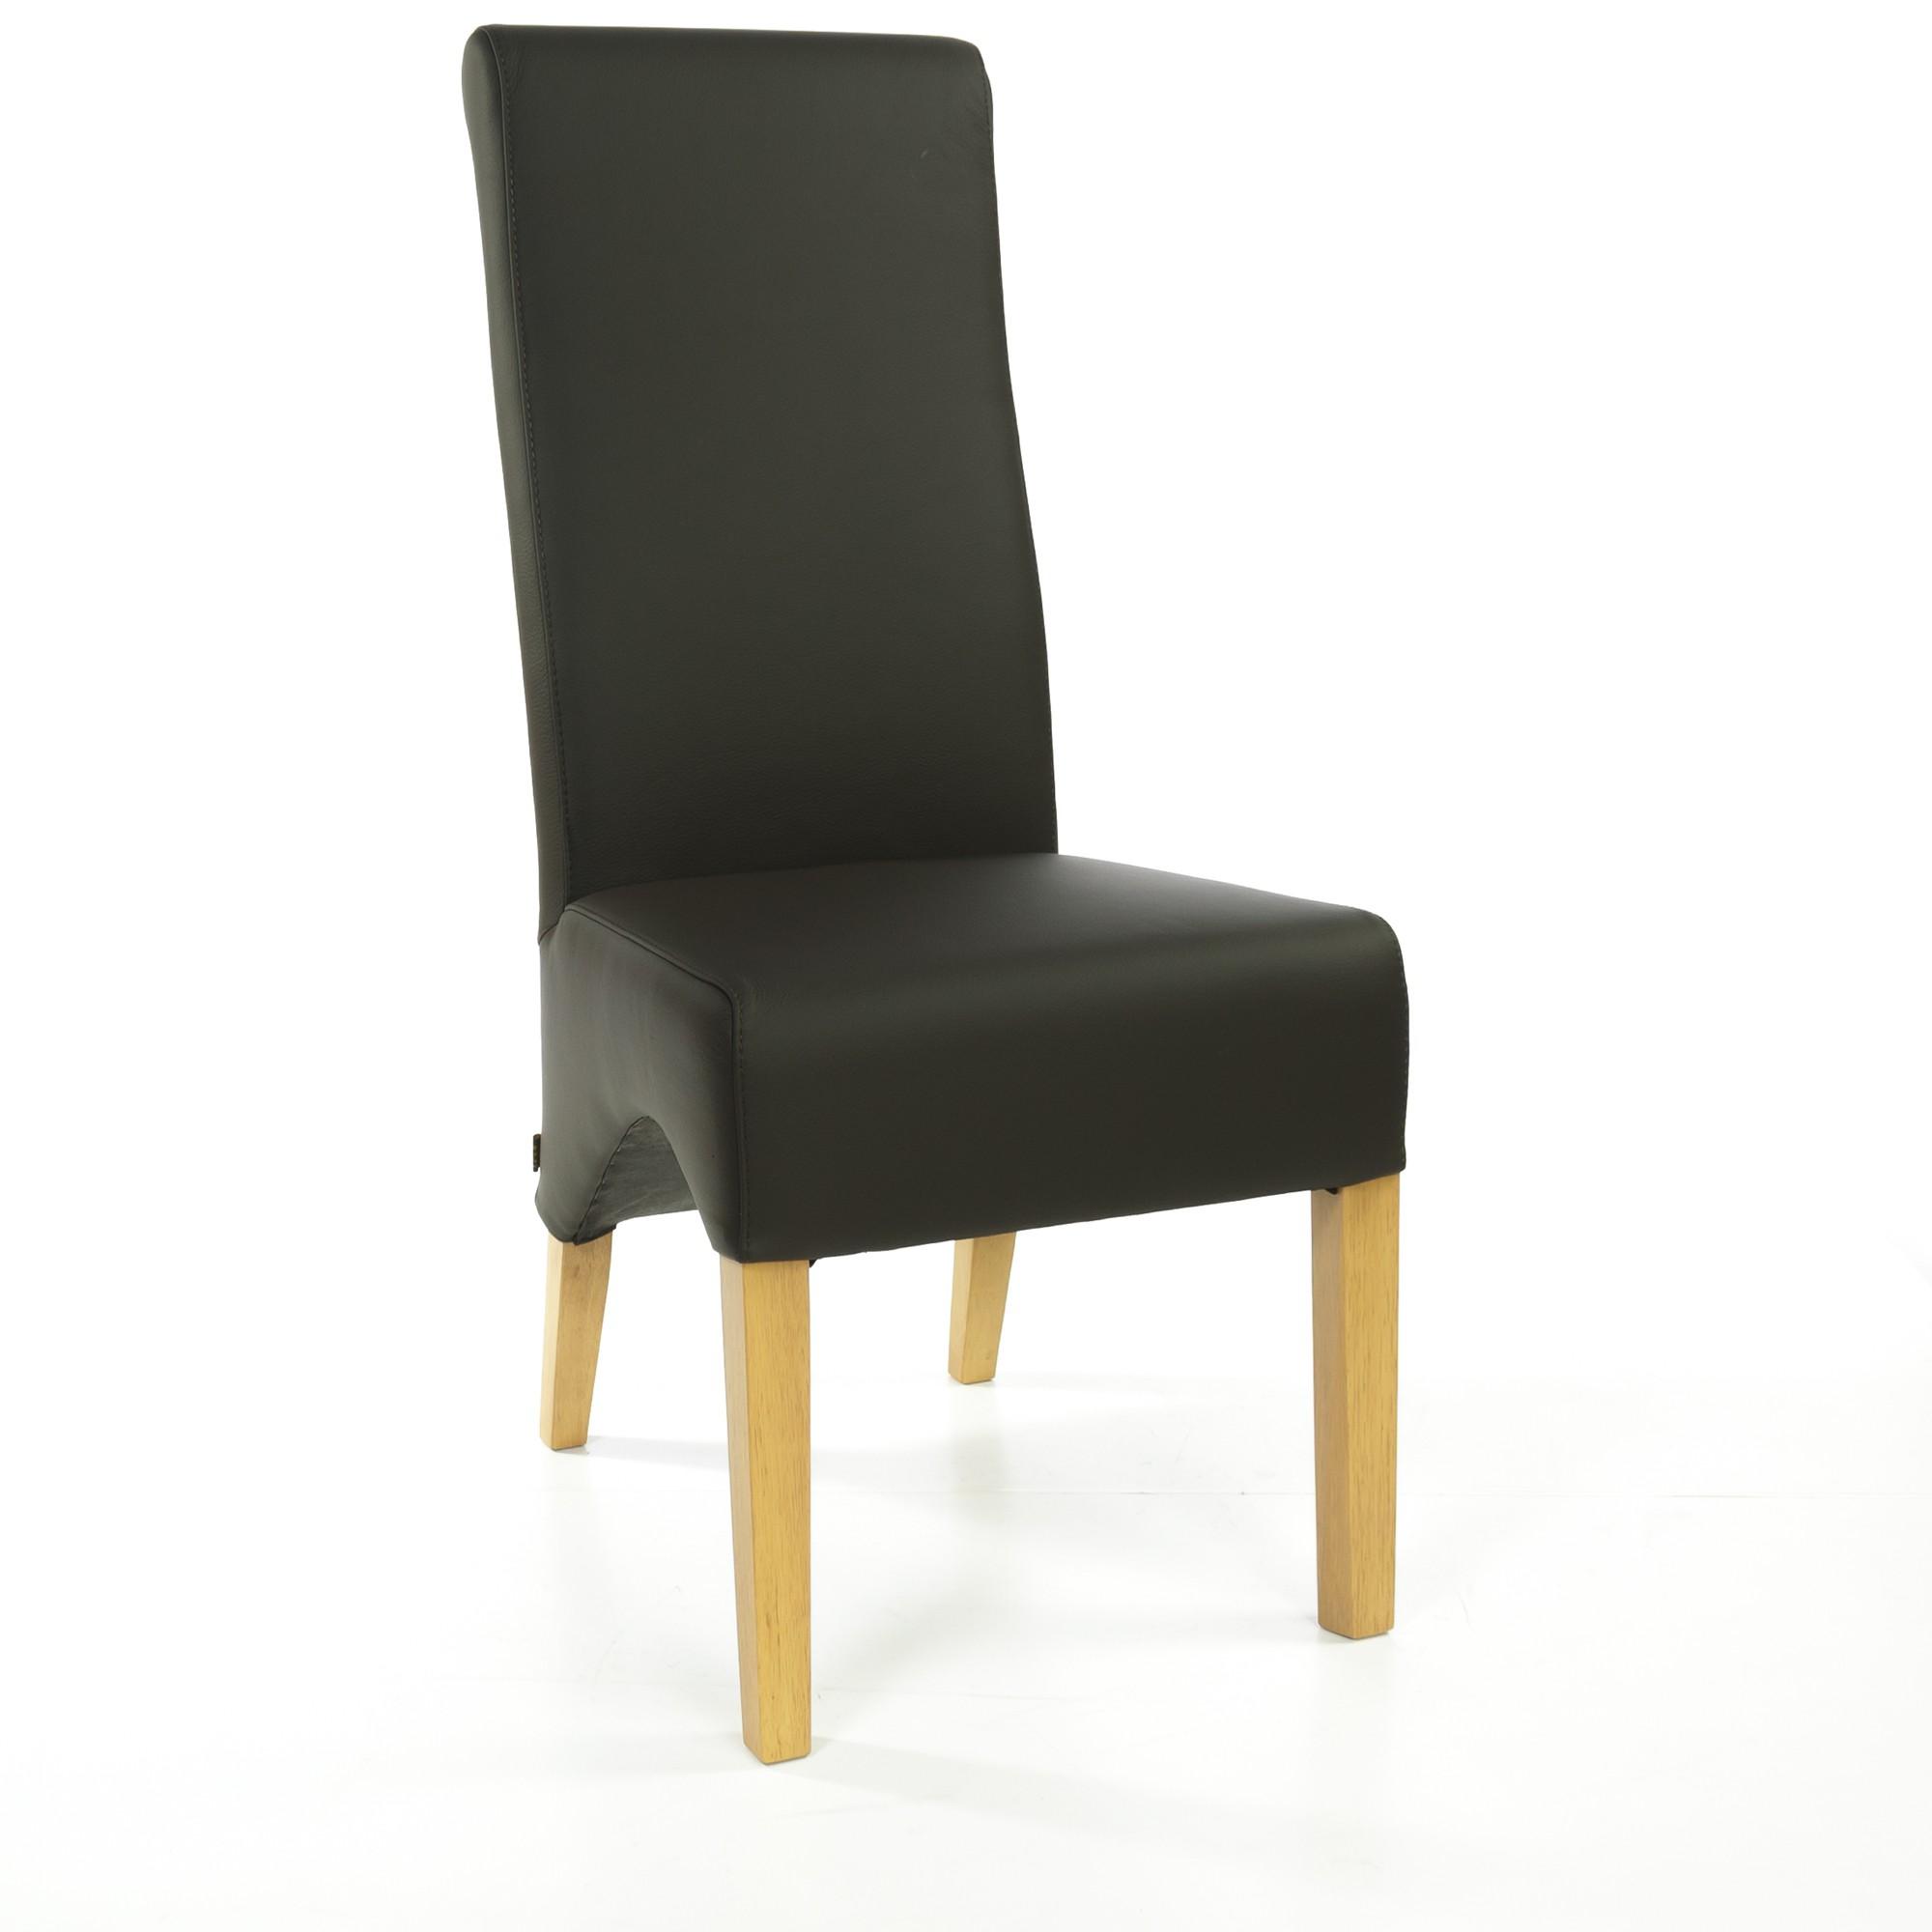 lederstuhl regina federkern schwarz eiche. Black Bedroom Furniture Sets. Home Design Ideas